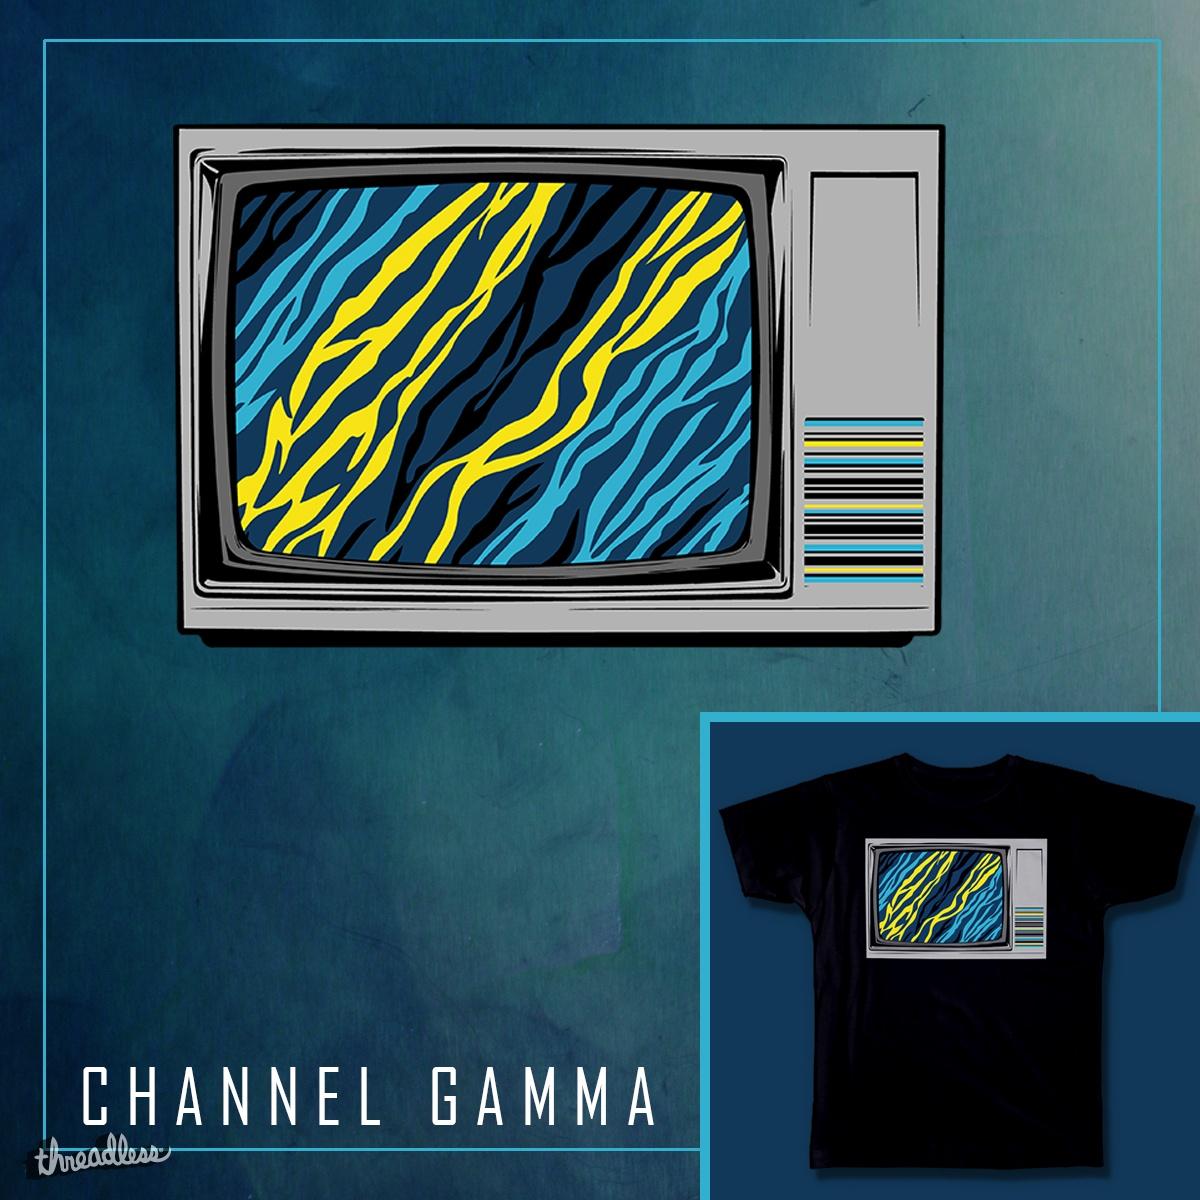 Channel Gamma by nxtgfx on Threadless